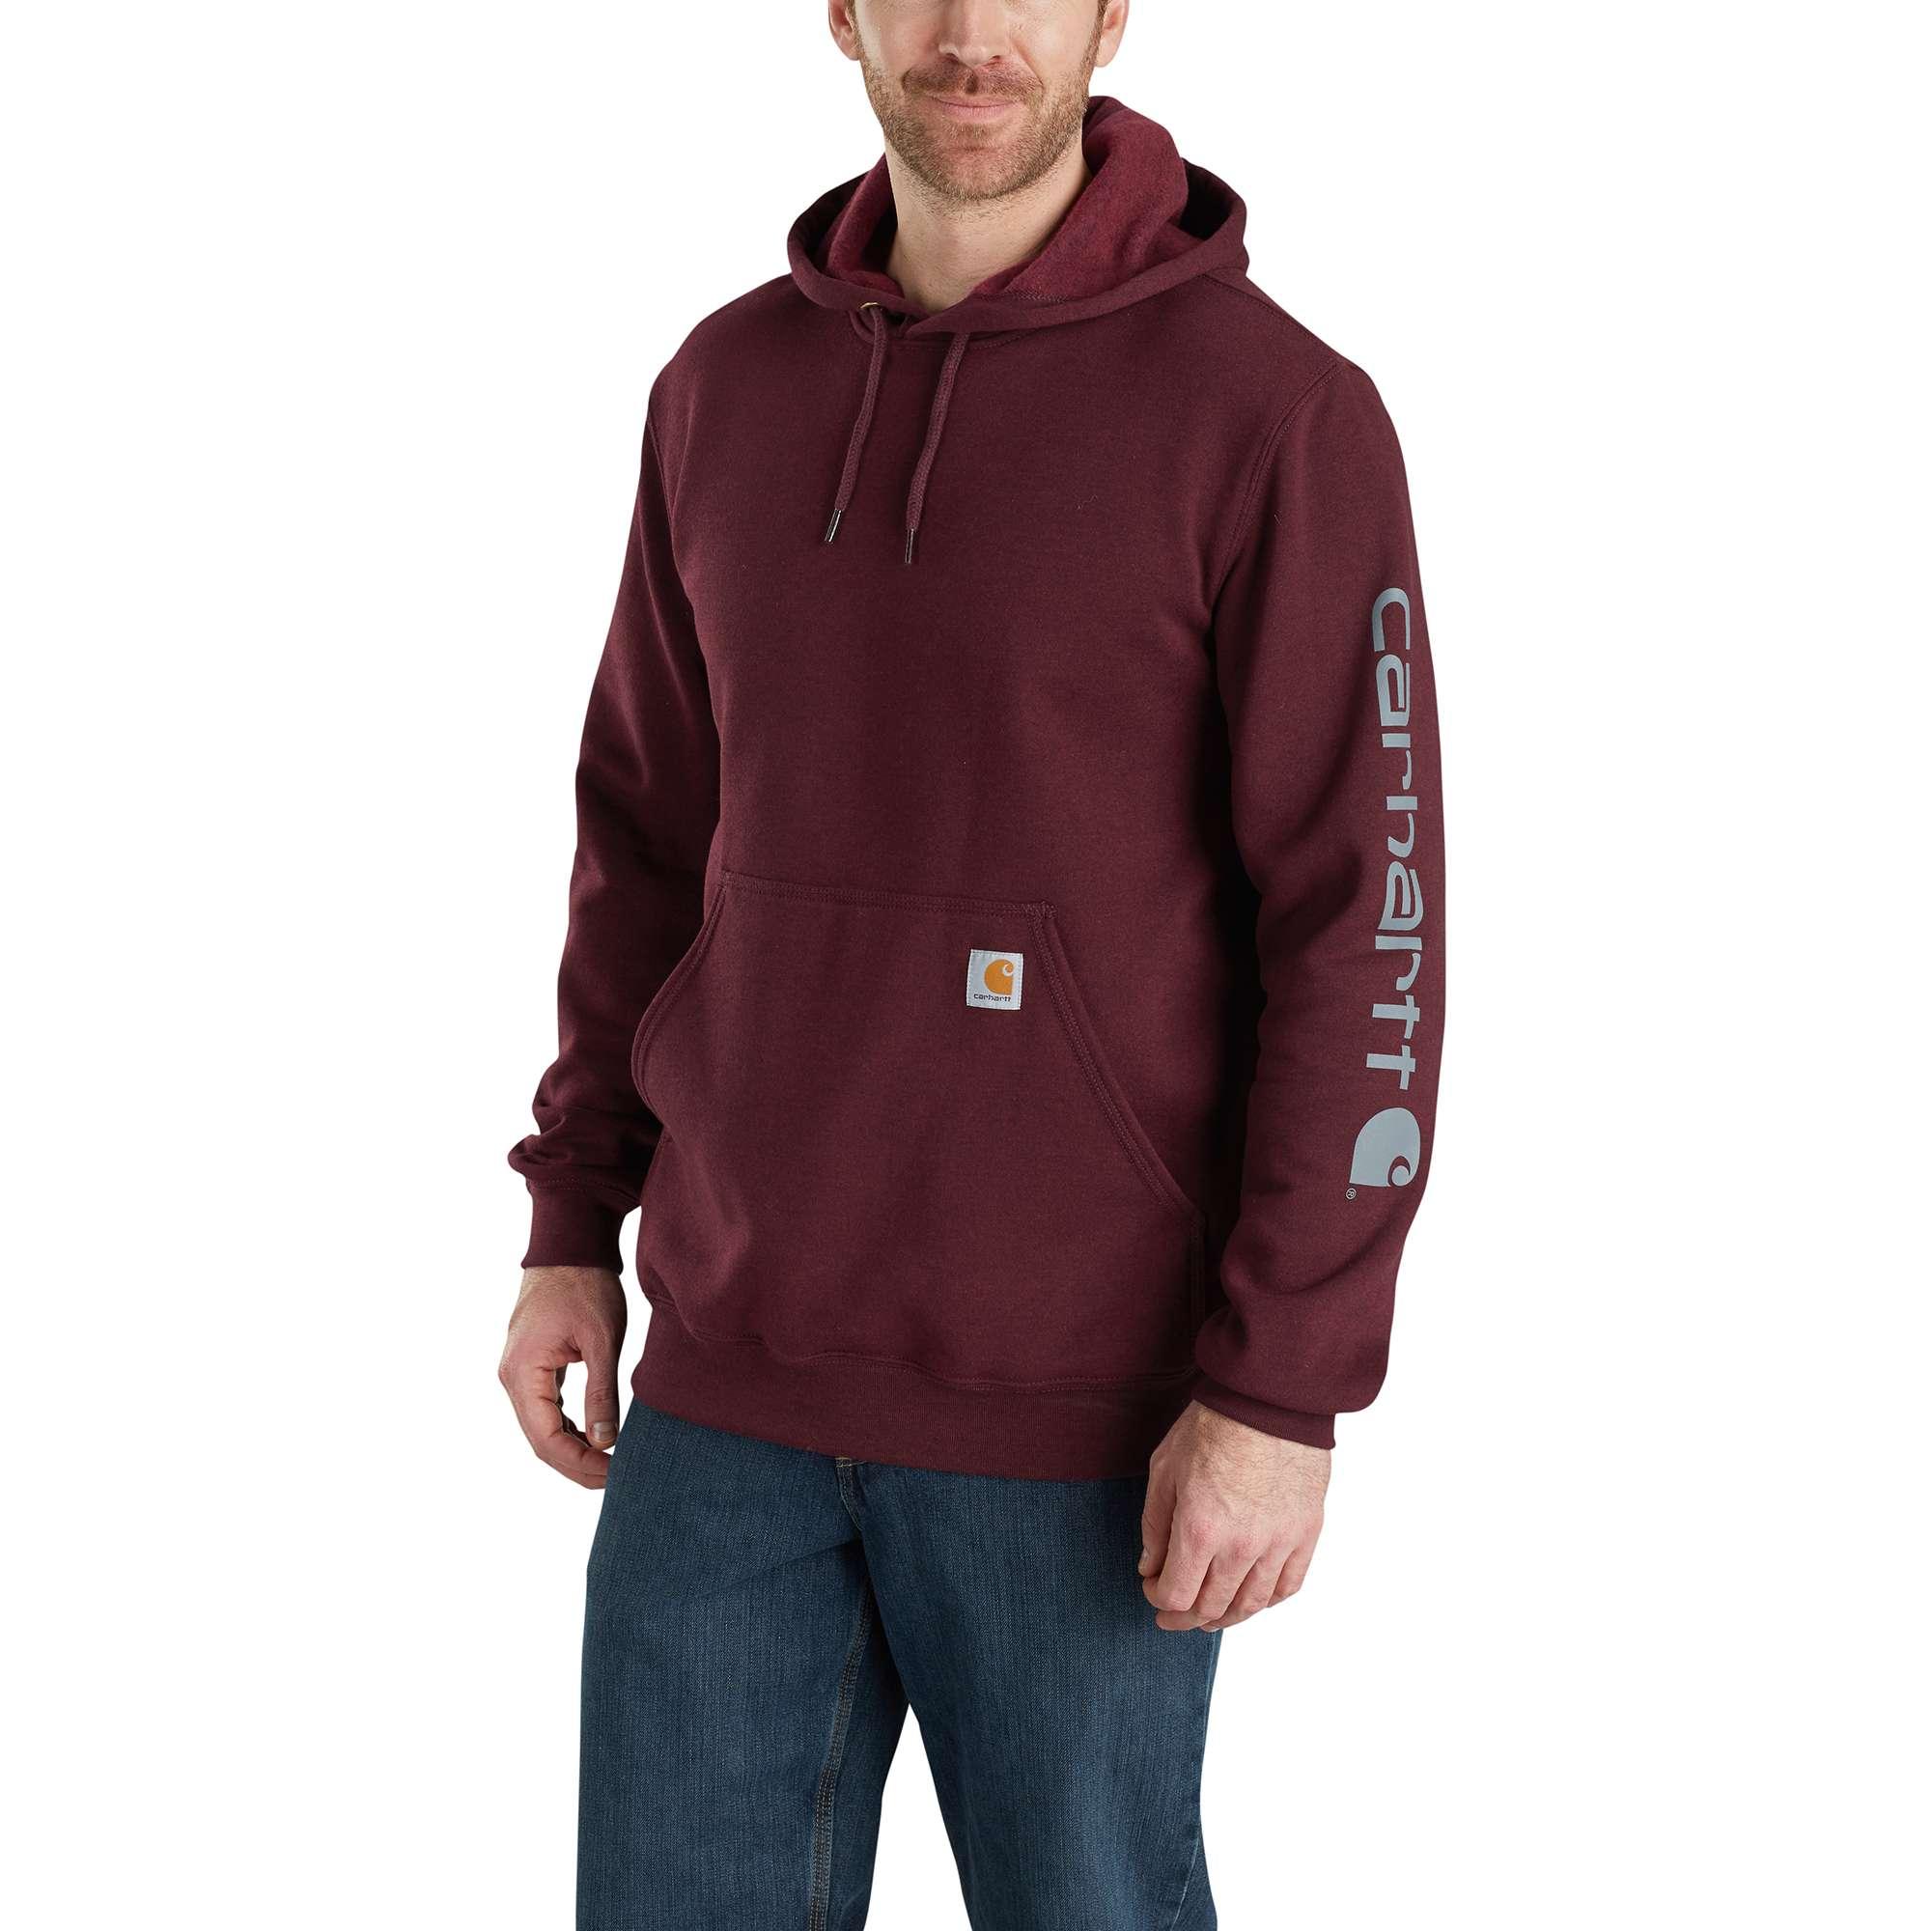 Men's Midweight Signature Logo Sleeve Hooded Sweatshirt, Dk Red,Wine,Ruby,Burgandy, swatch